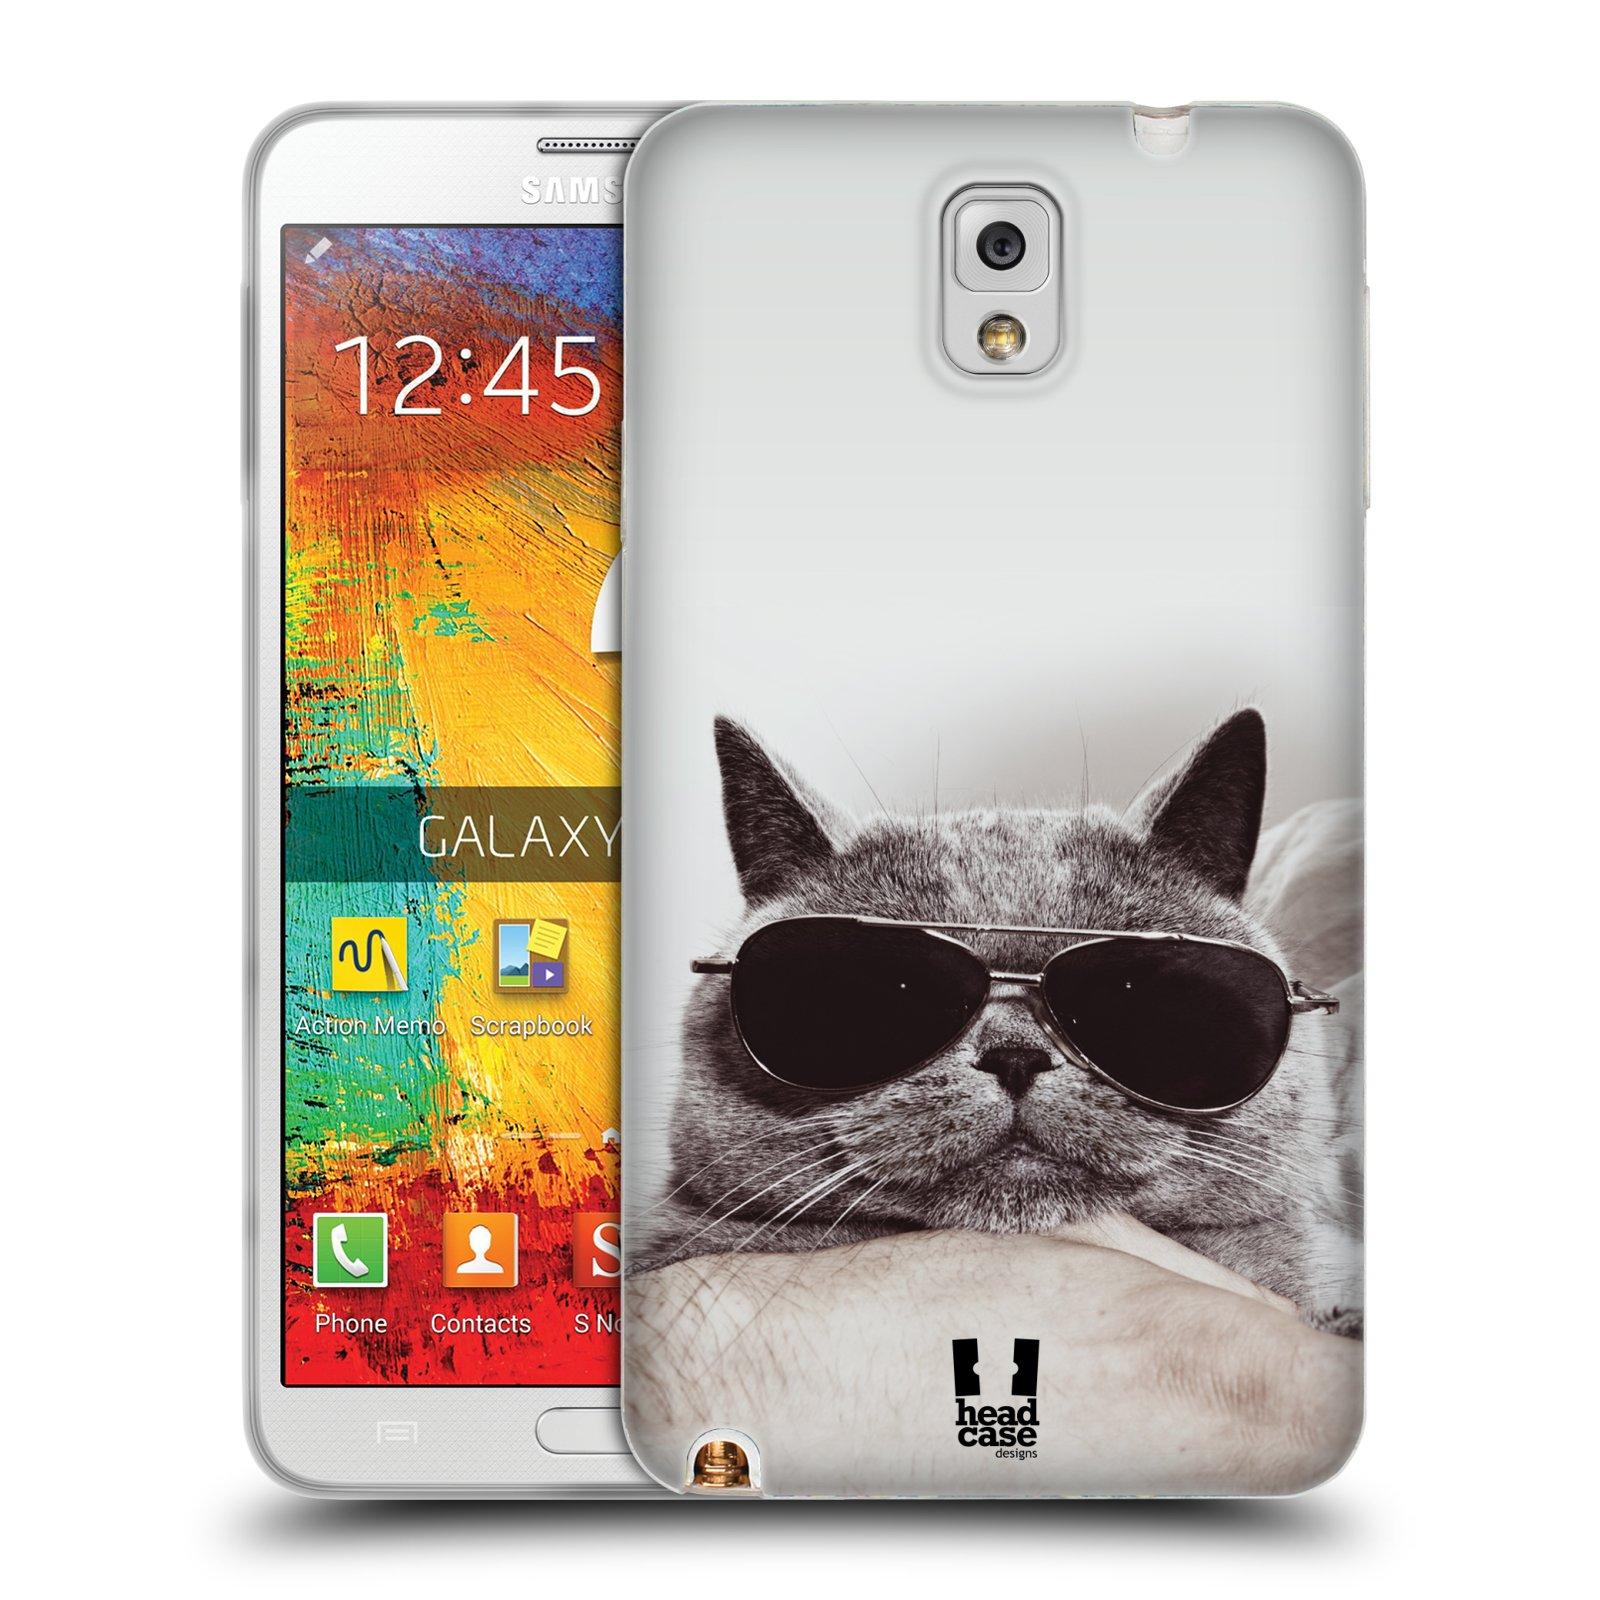 Silikonové pouzdro na mobil Samsung Galaxy Note 3 HEAD CASE KOTĚ S BRÝLEMI (Silikonový kryt či obal na mobilní telefon Samsung Galaxy Note 3 SM-N9005)